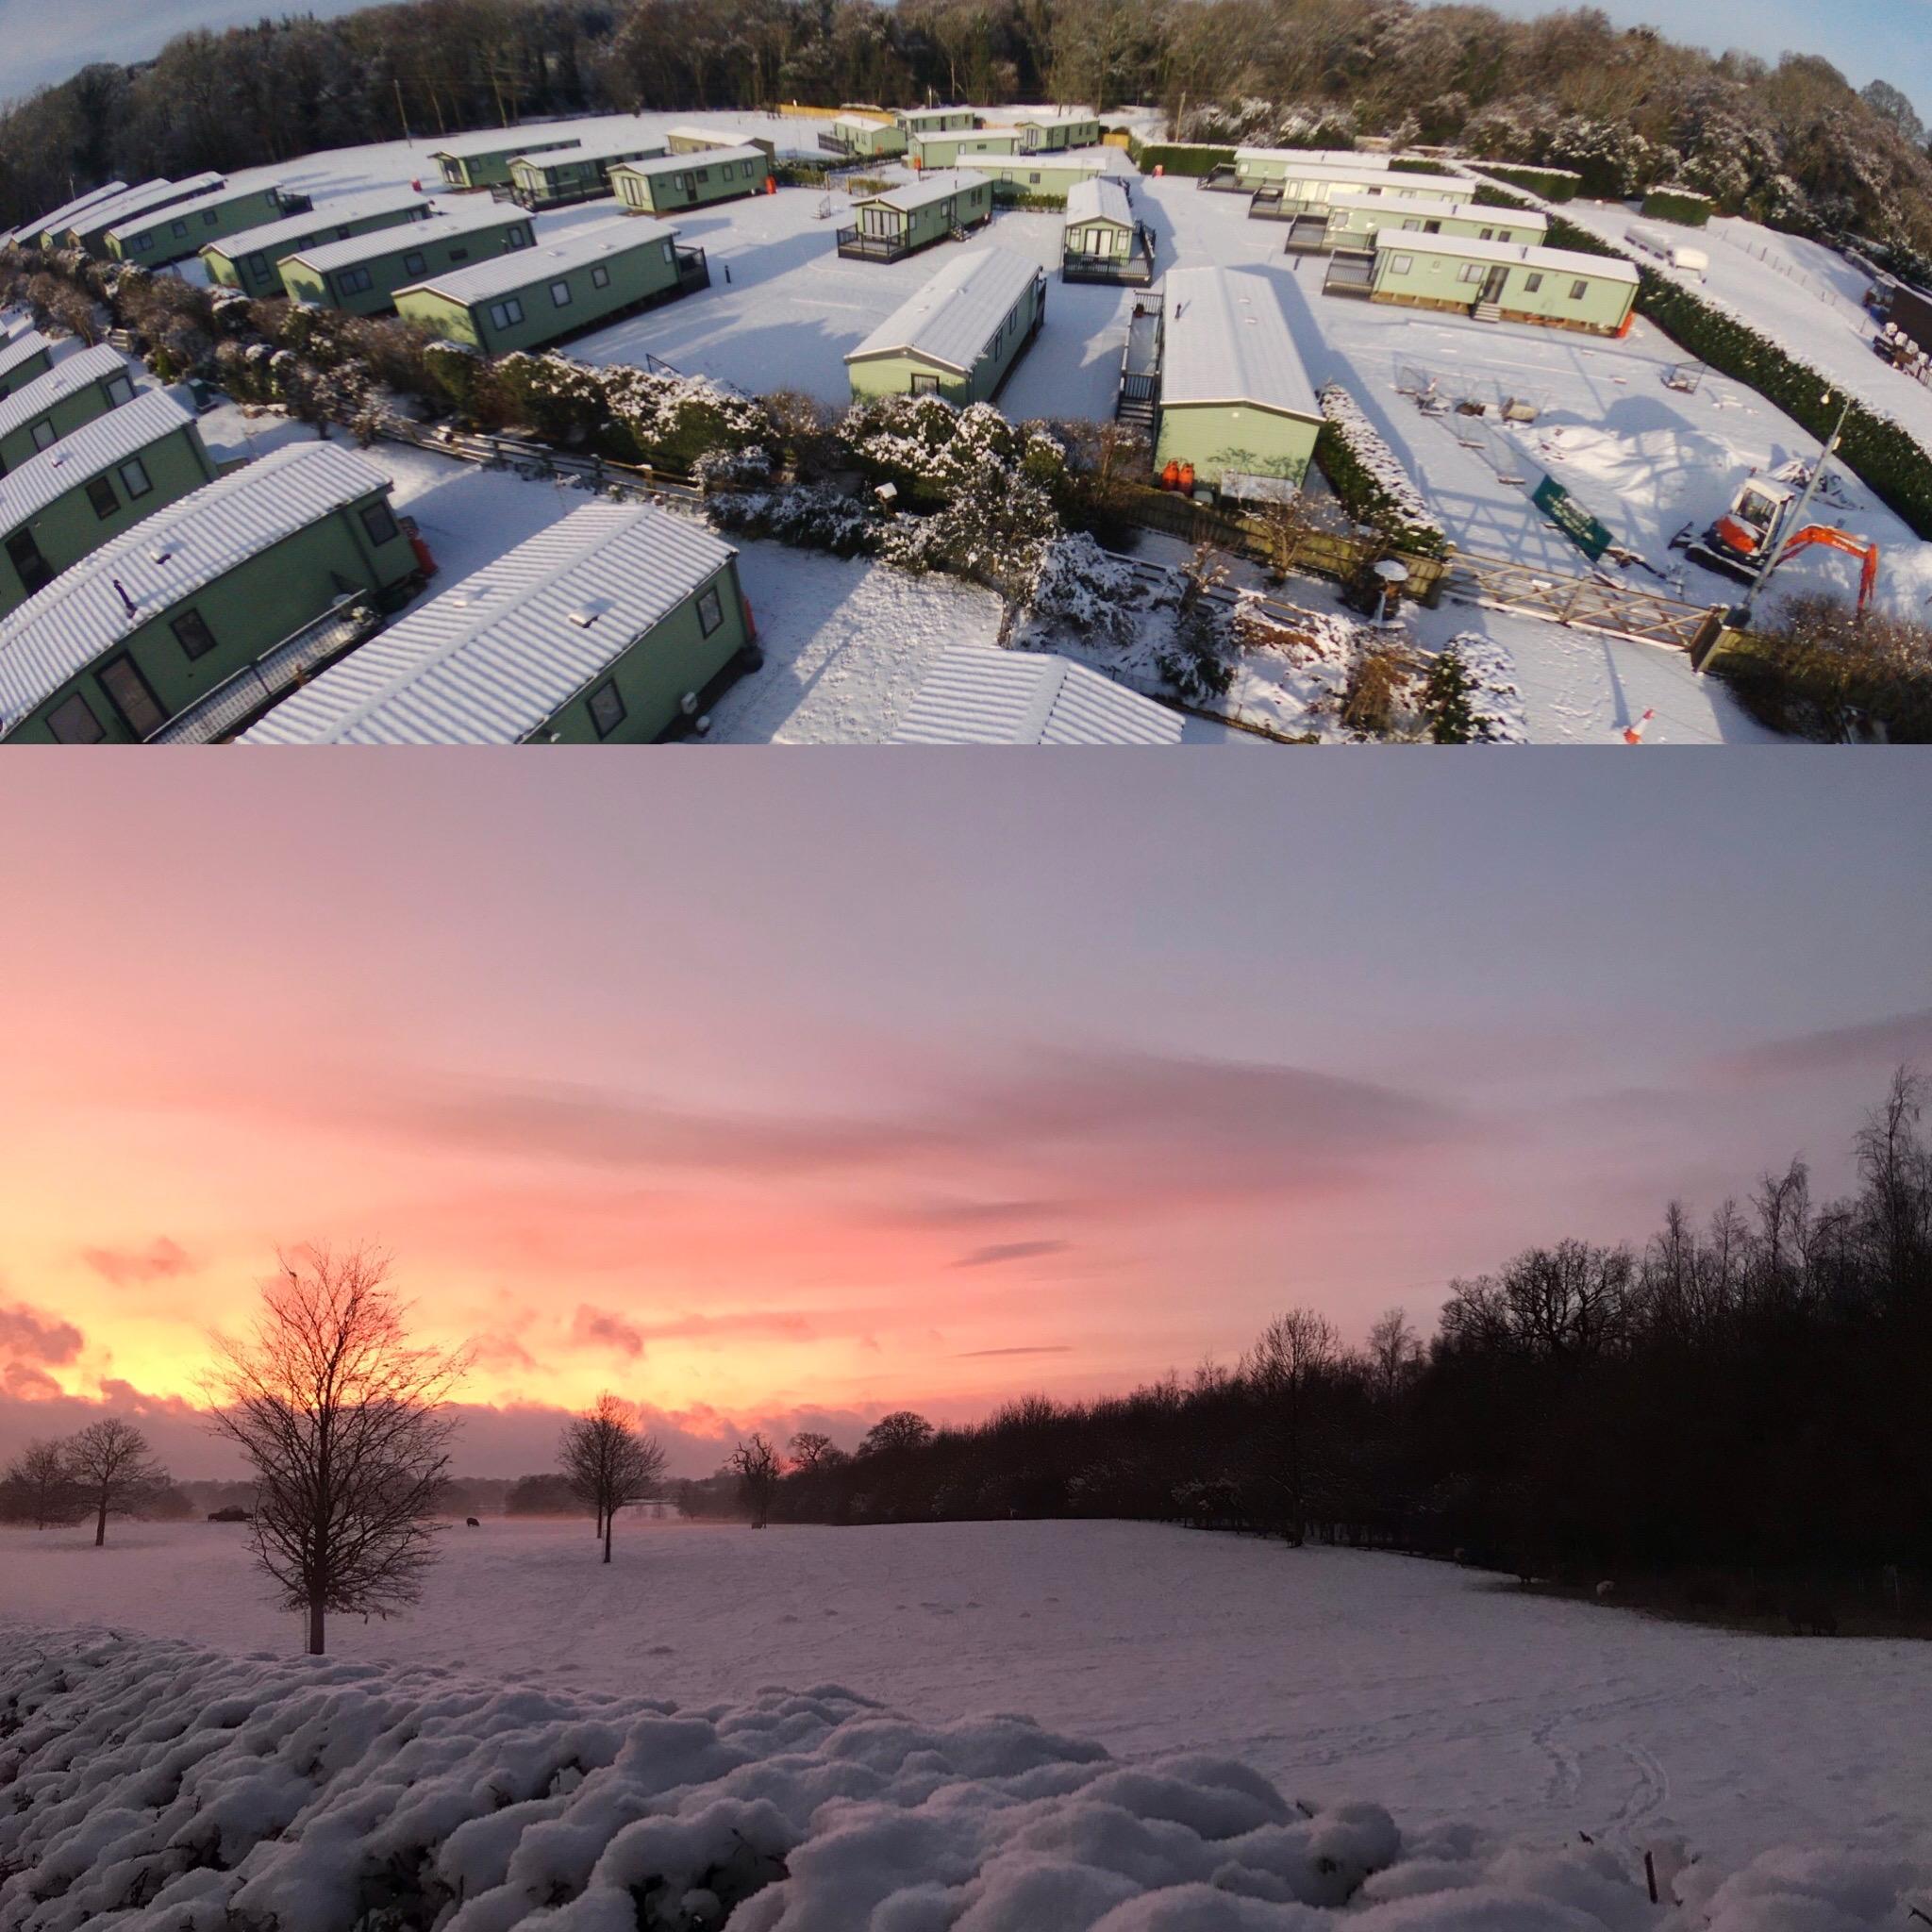 January 9th 2021 - White Winter